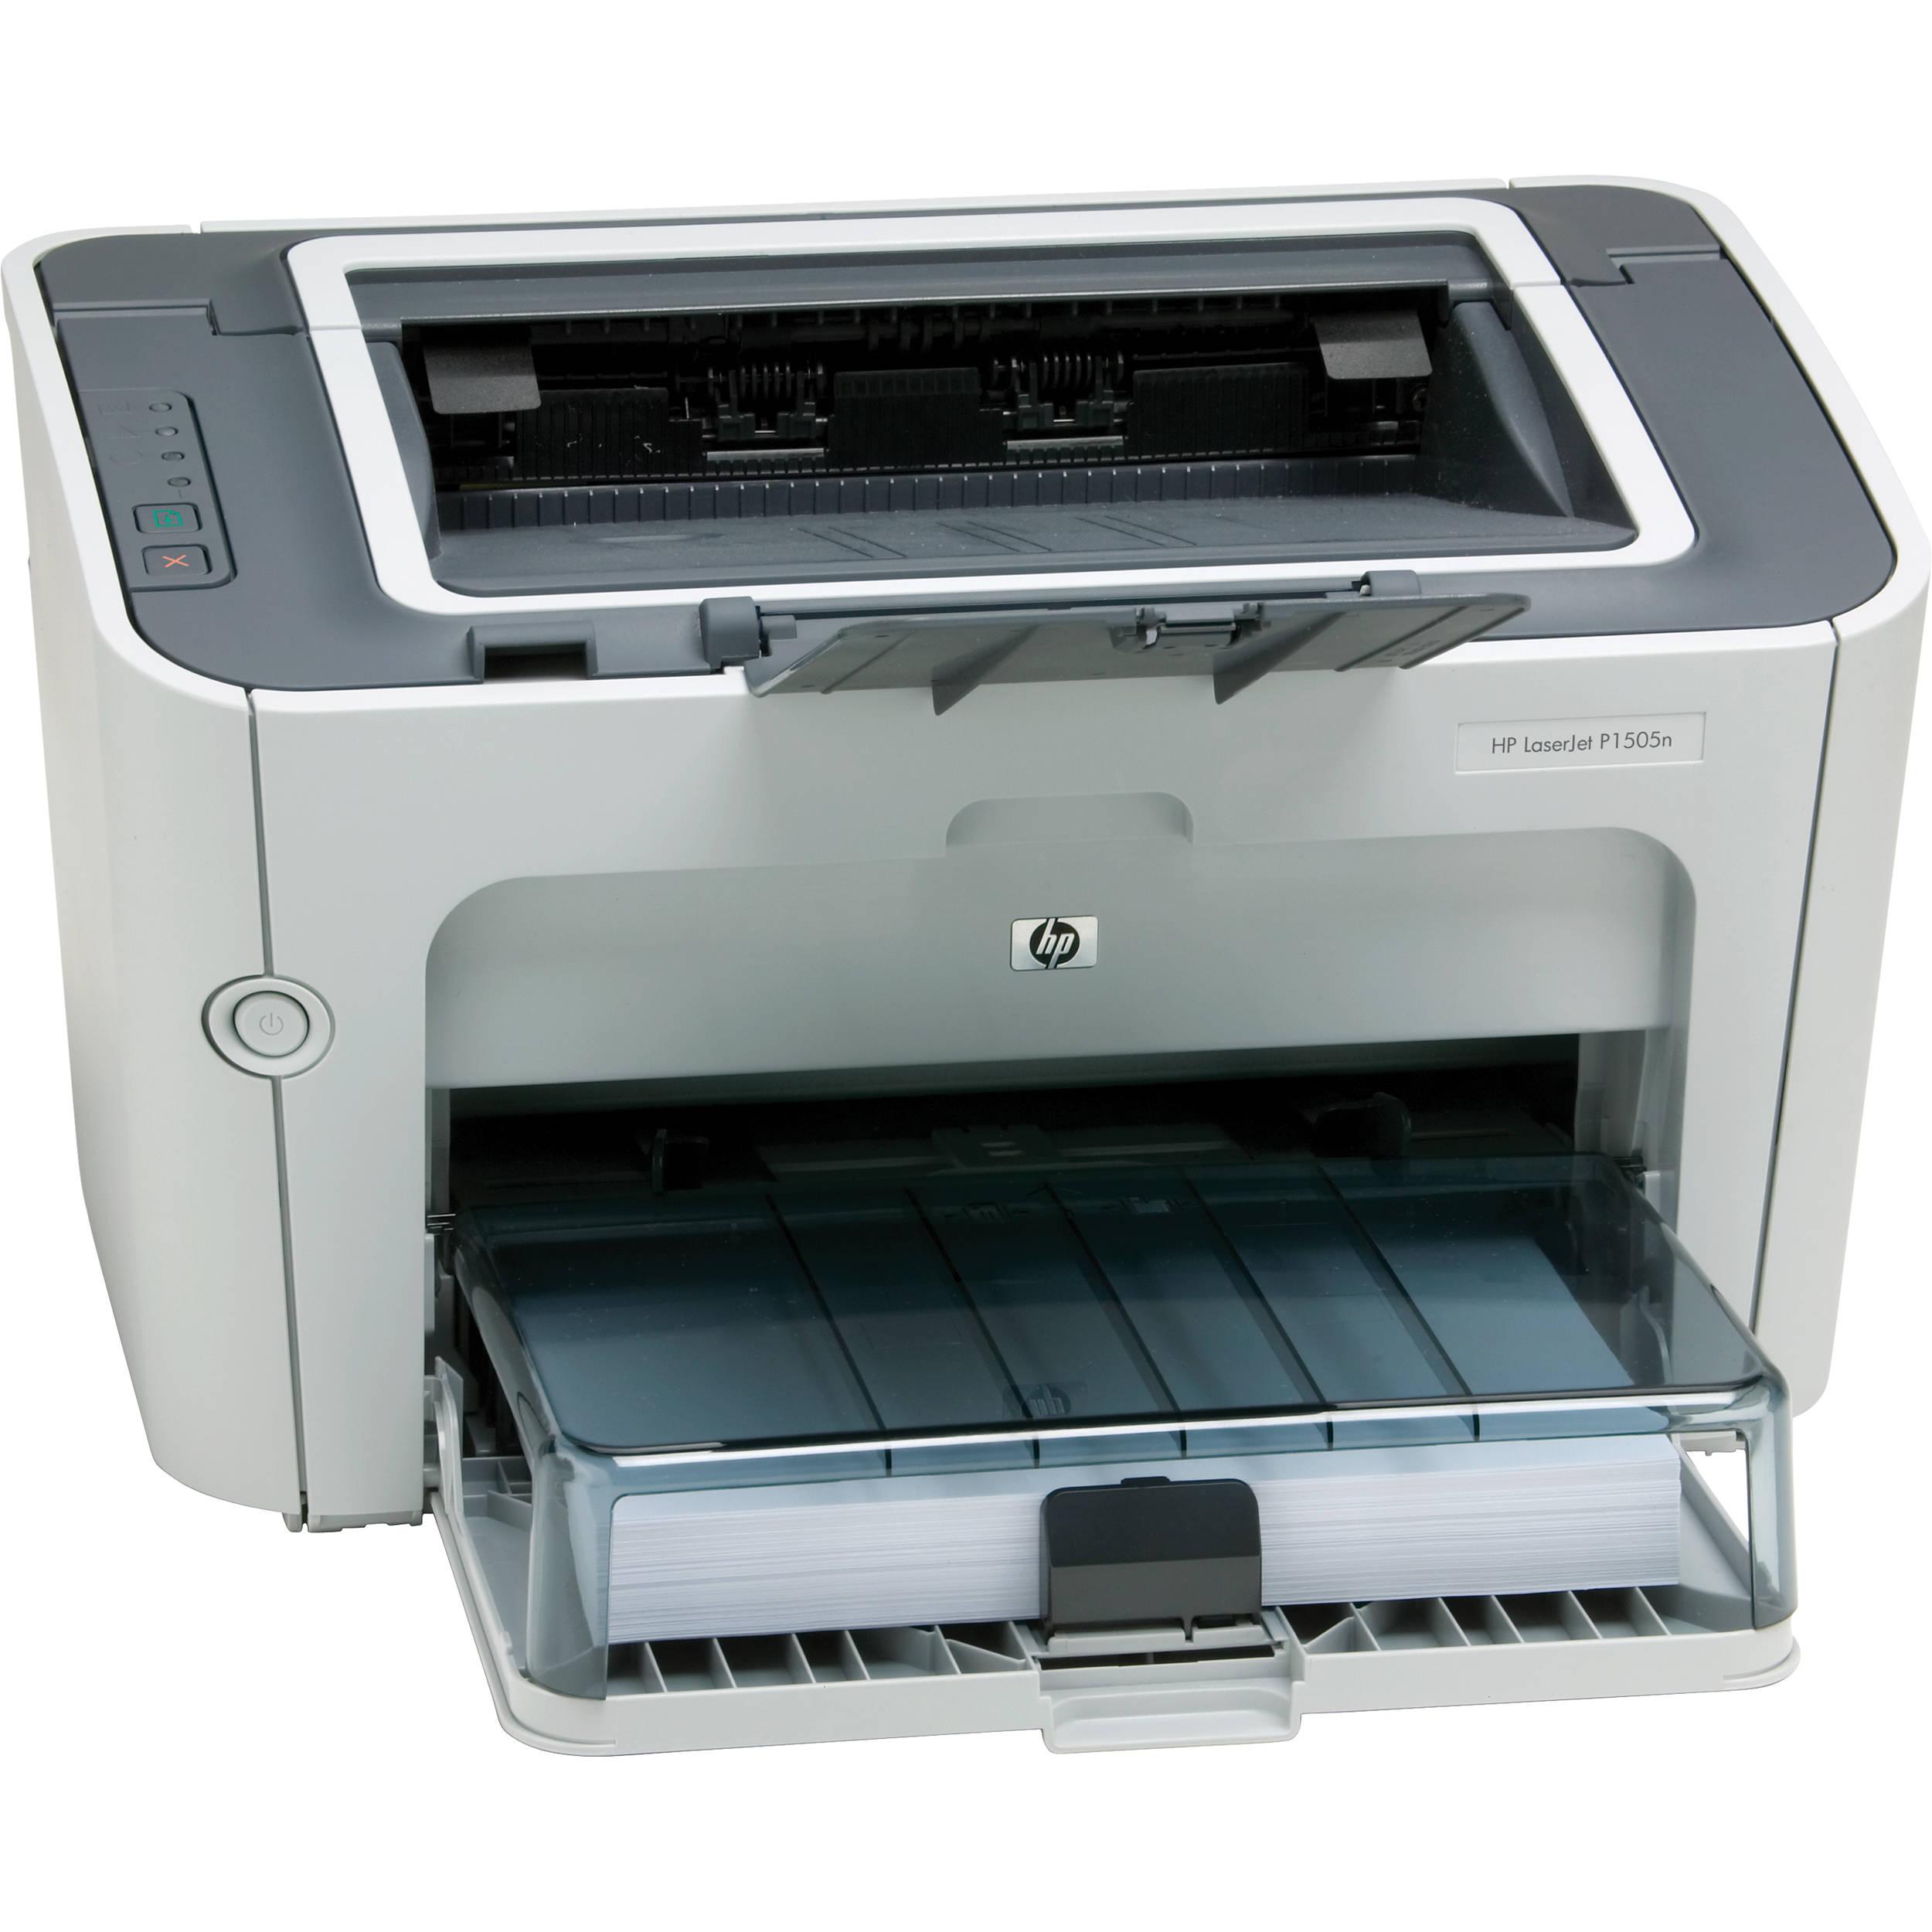 Принтер HP LaserJet P1505n Printer